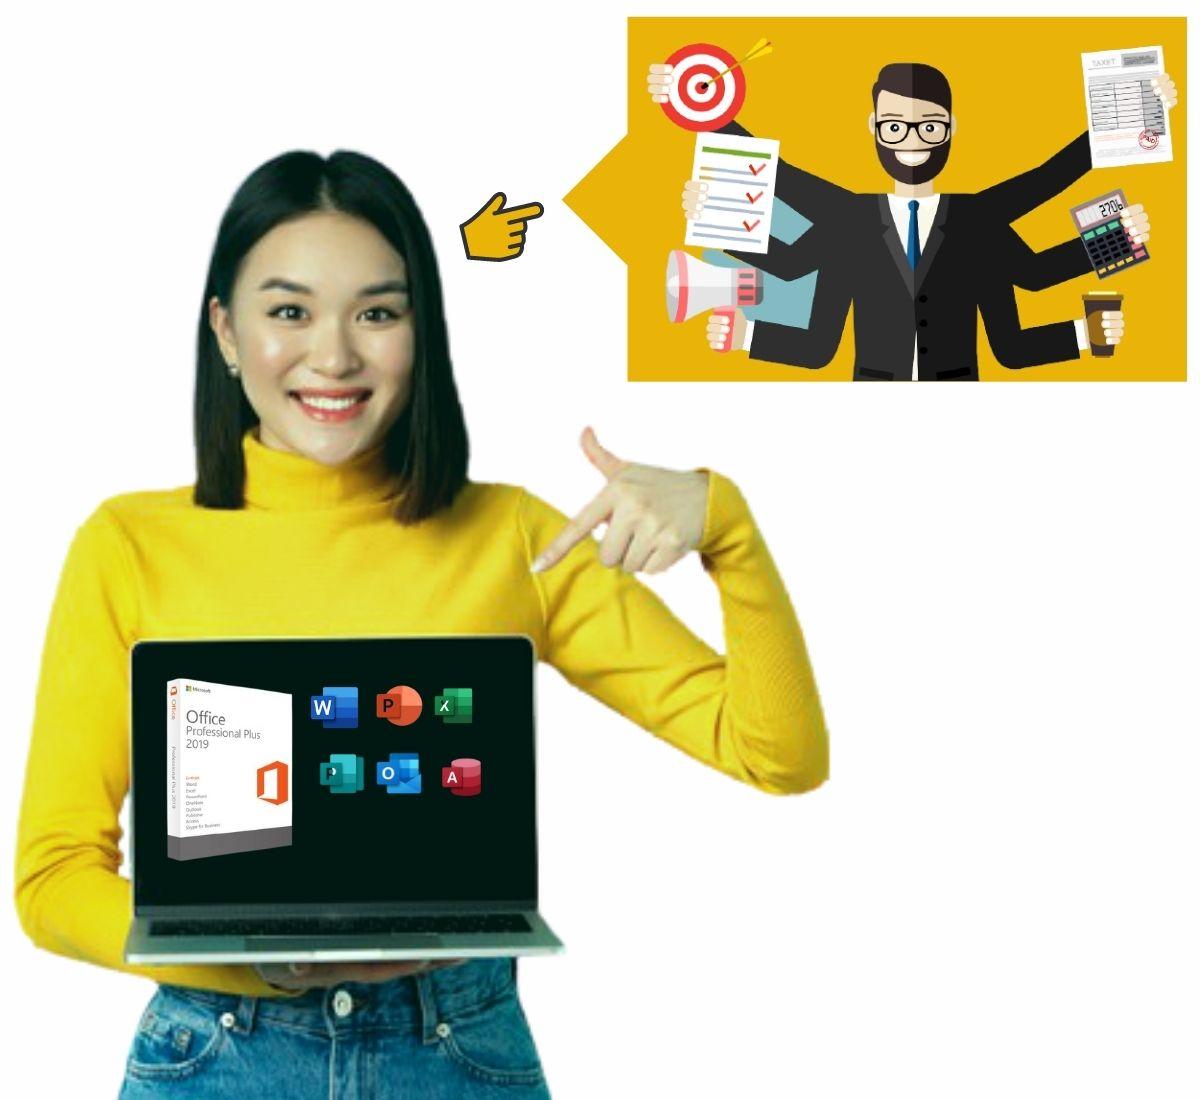 improvements of the Key Microsoft Office 2019 Professional Plus